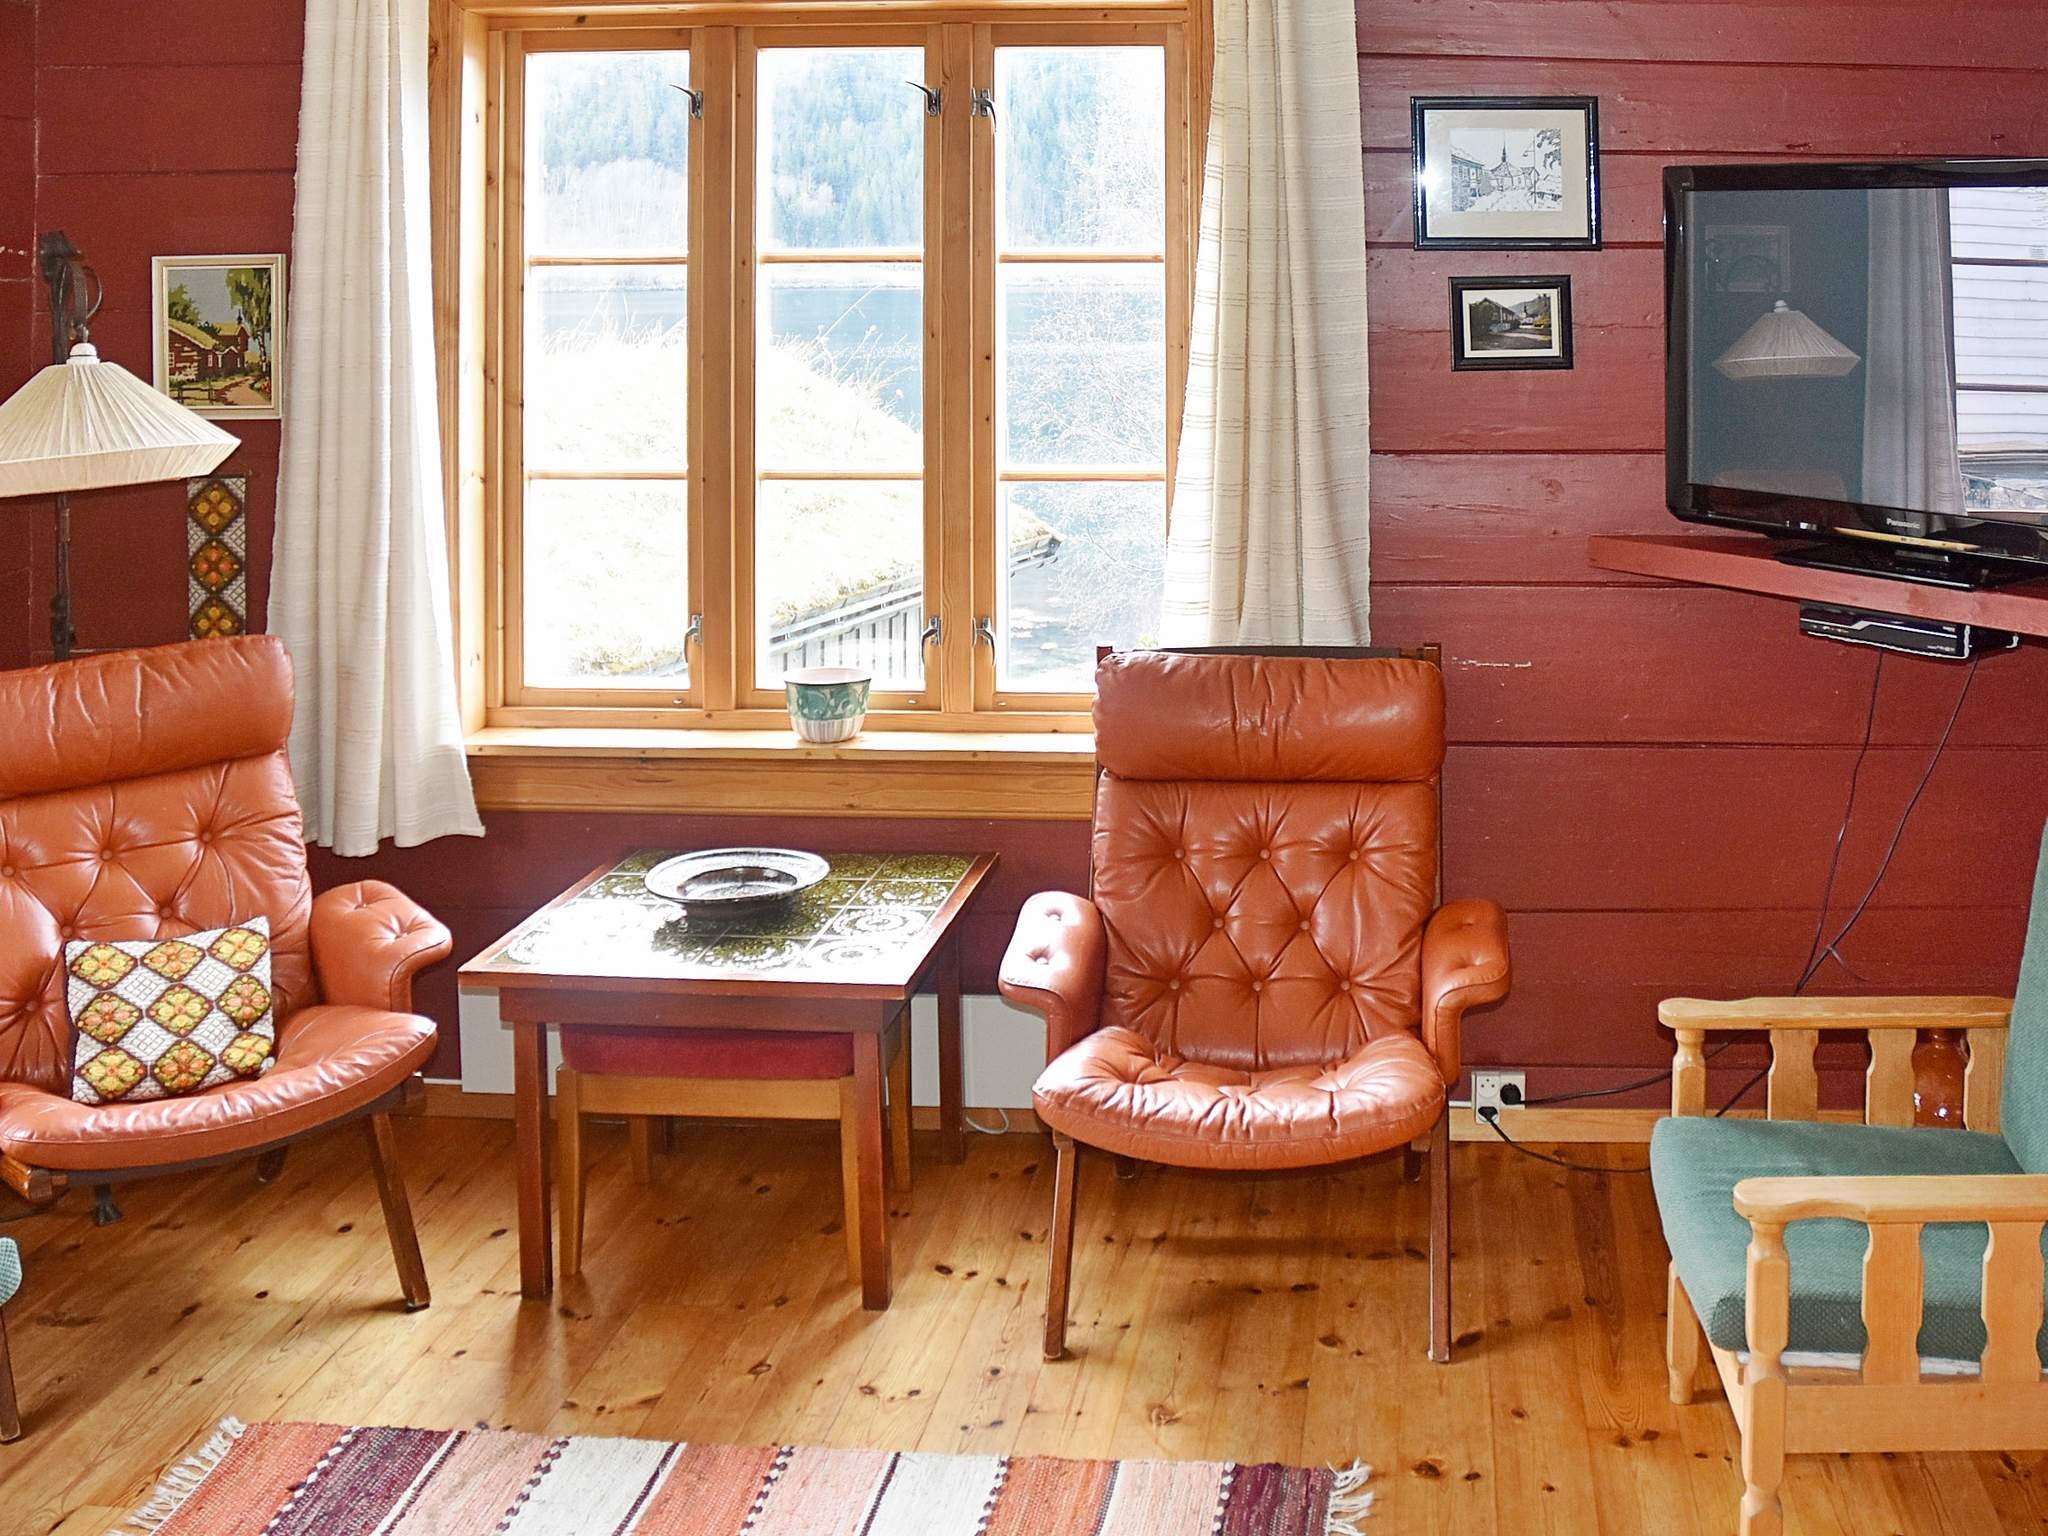 Ferienhaus Norddal (85061), Norddal, More - Romsdal, Westnorwegen, Norwegen, Bild 5